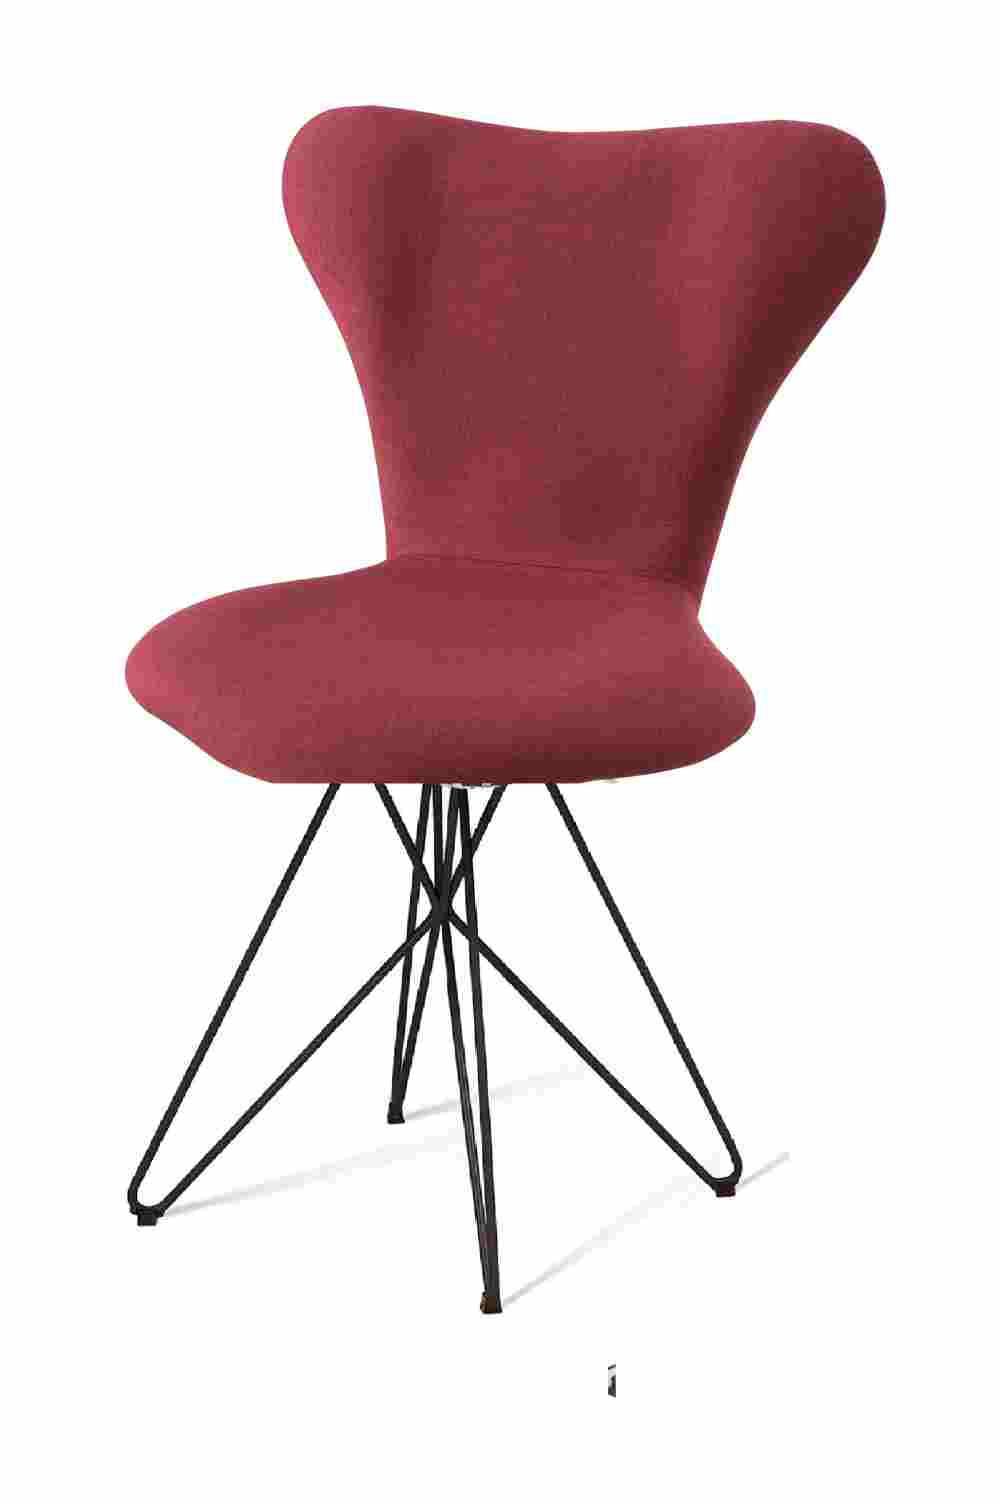 Cadeira Jacobsen Series 7 Marsala com Base Estrela Preta - 55926